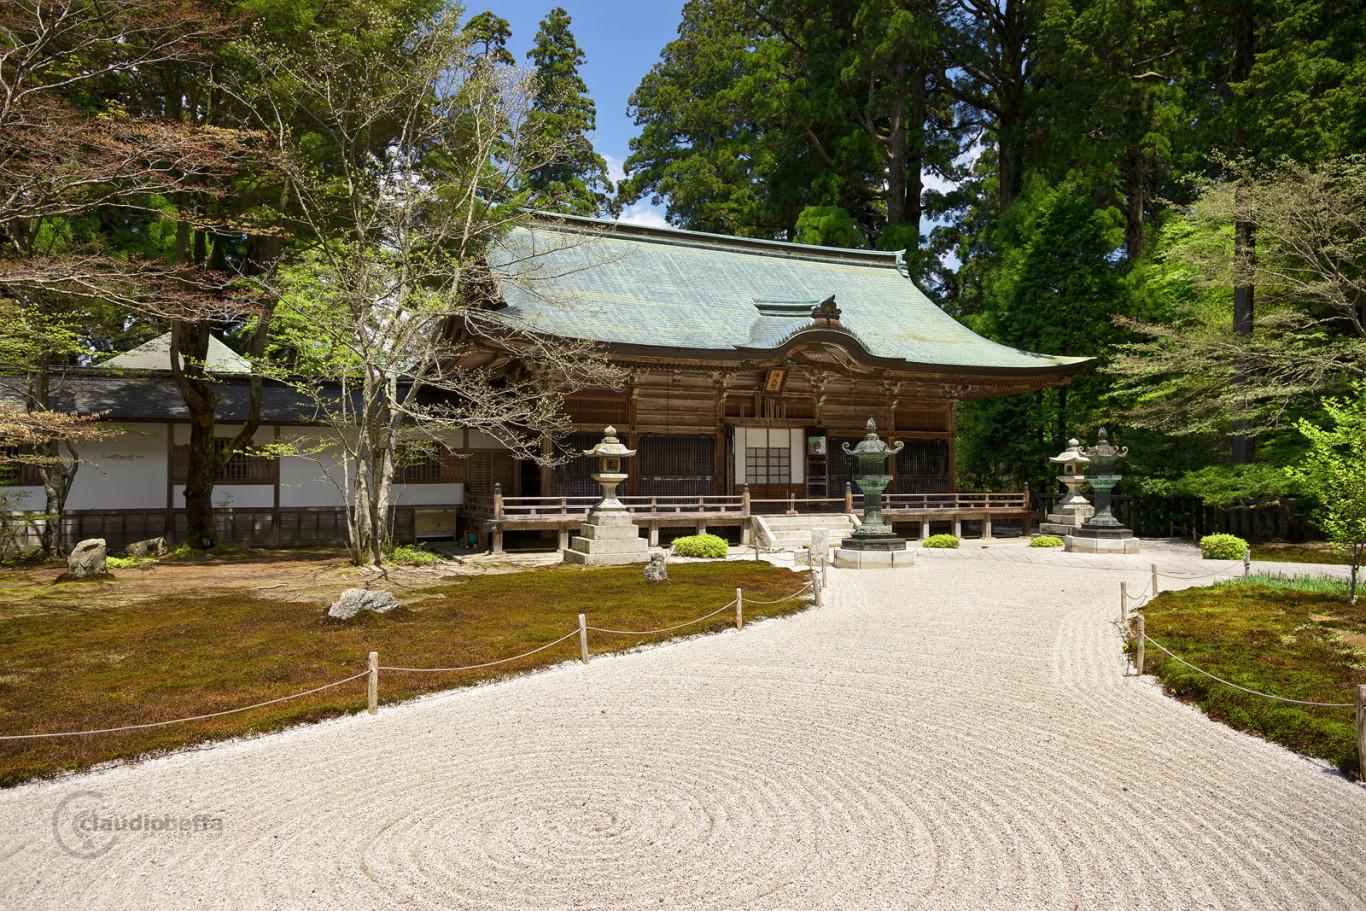 Hiei, Hieizan, Mountain, Enryakuji, Jodo-in, Temple, Buddhism, Garden, Stones, Lanterns, Forest, Japan, Pentax